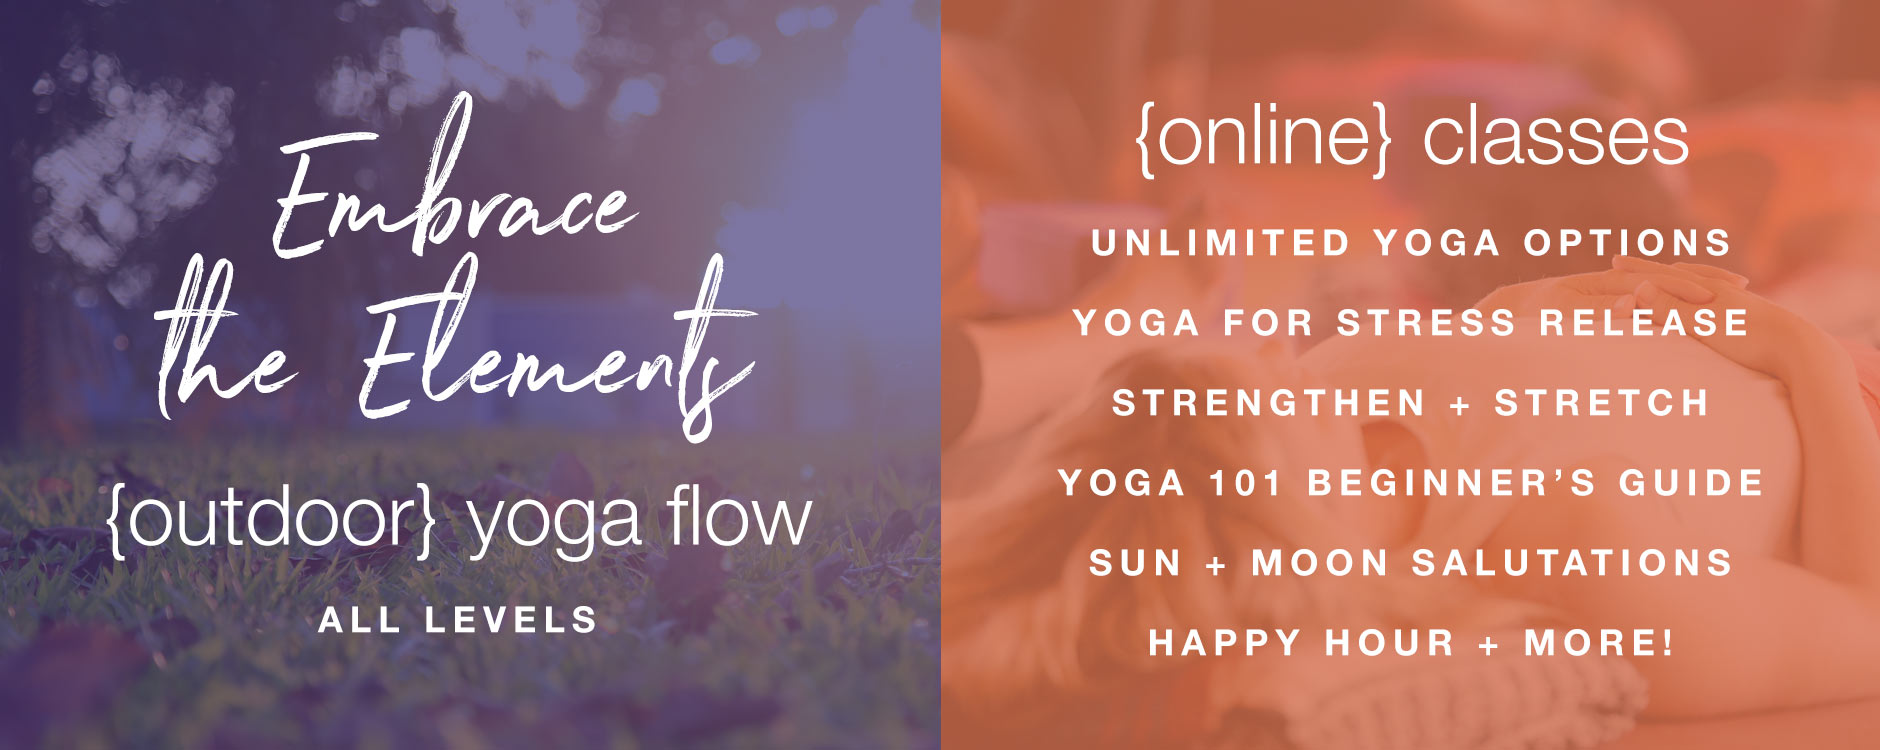 FORM yoga Decatur outdoor yoga online classes